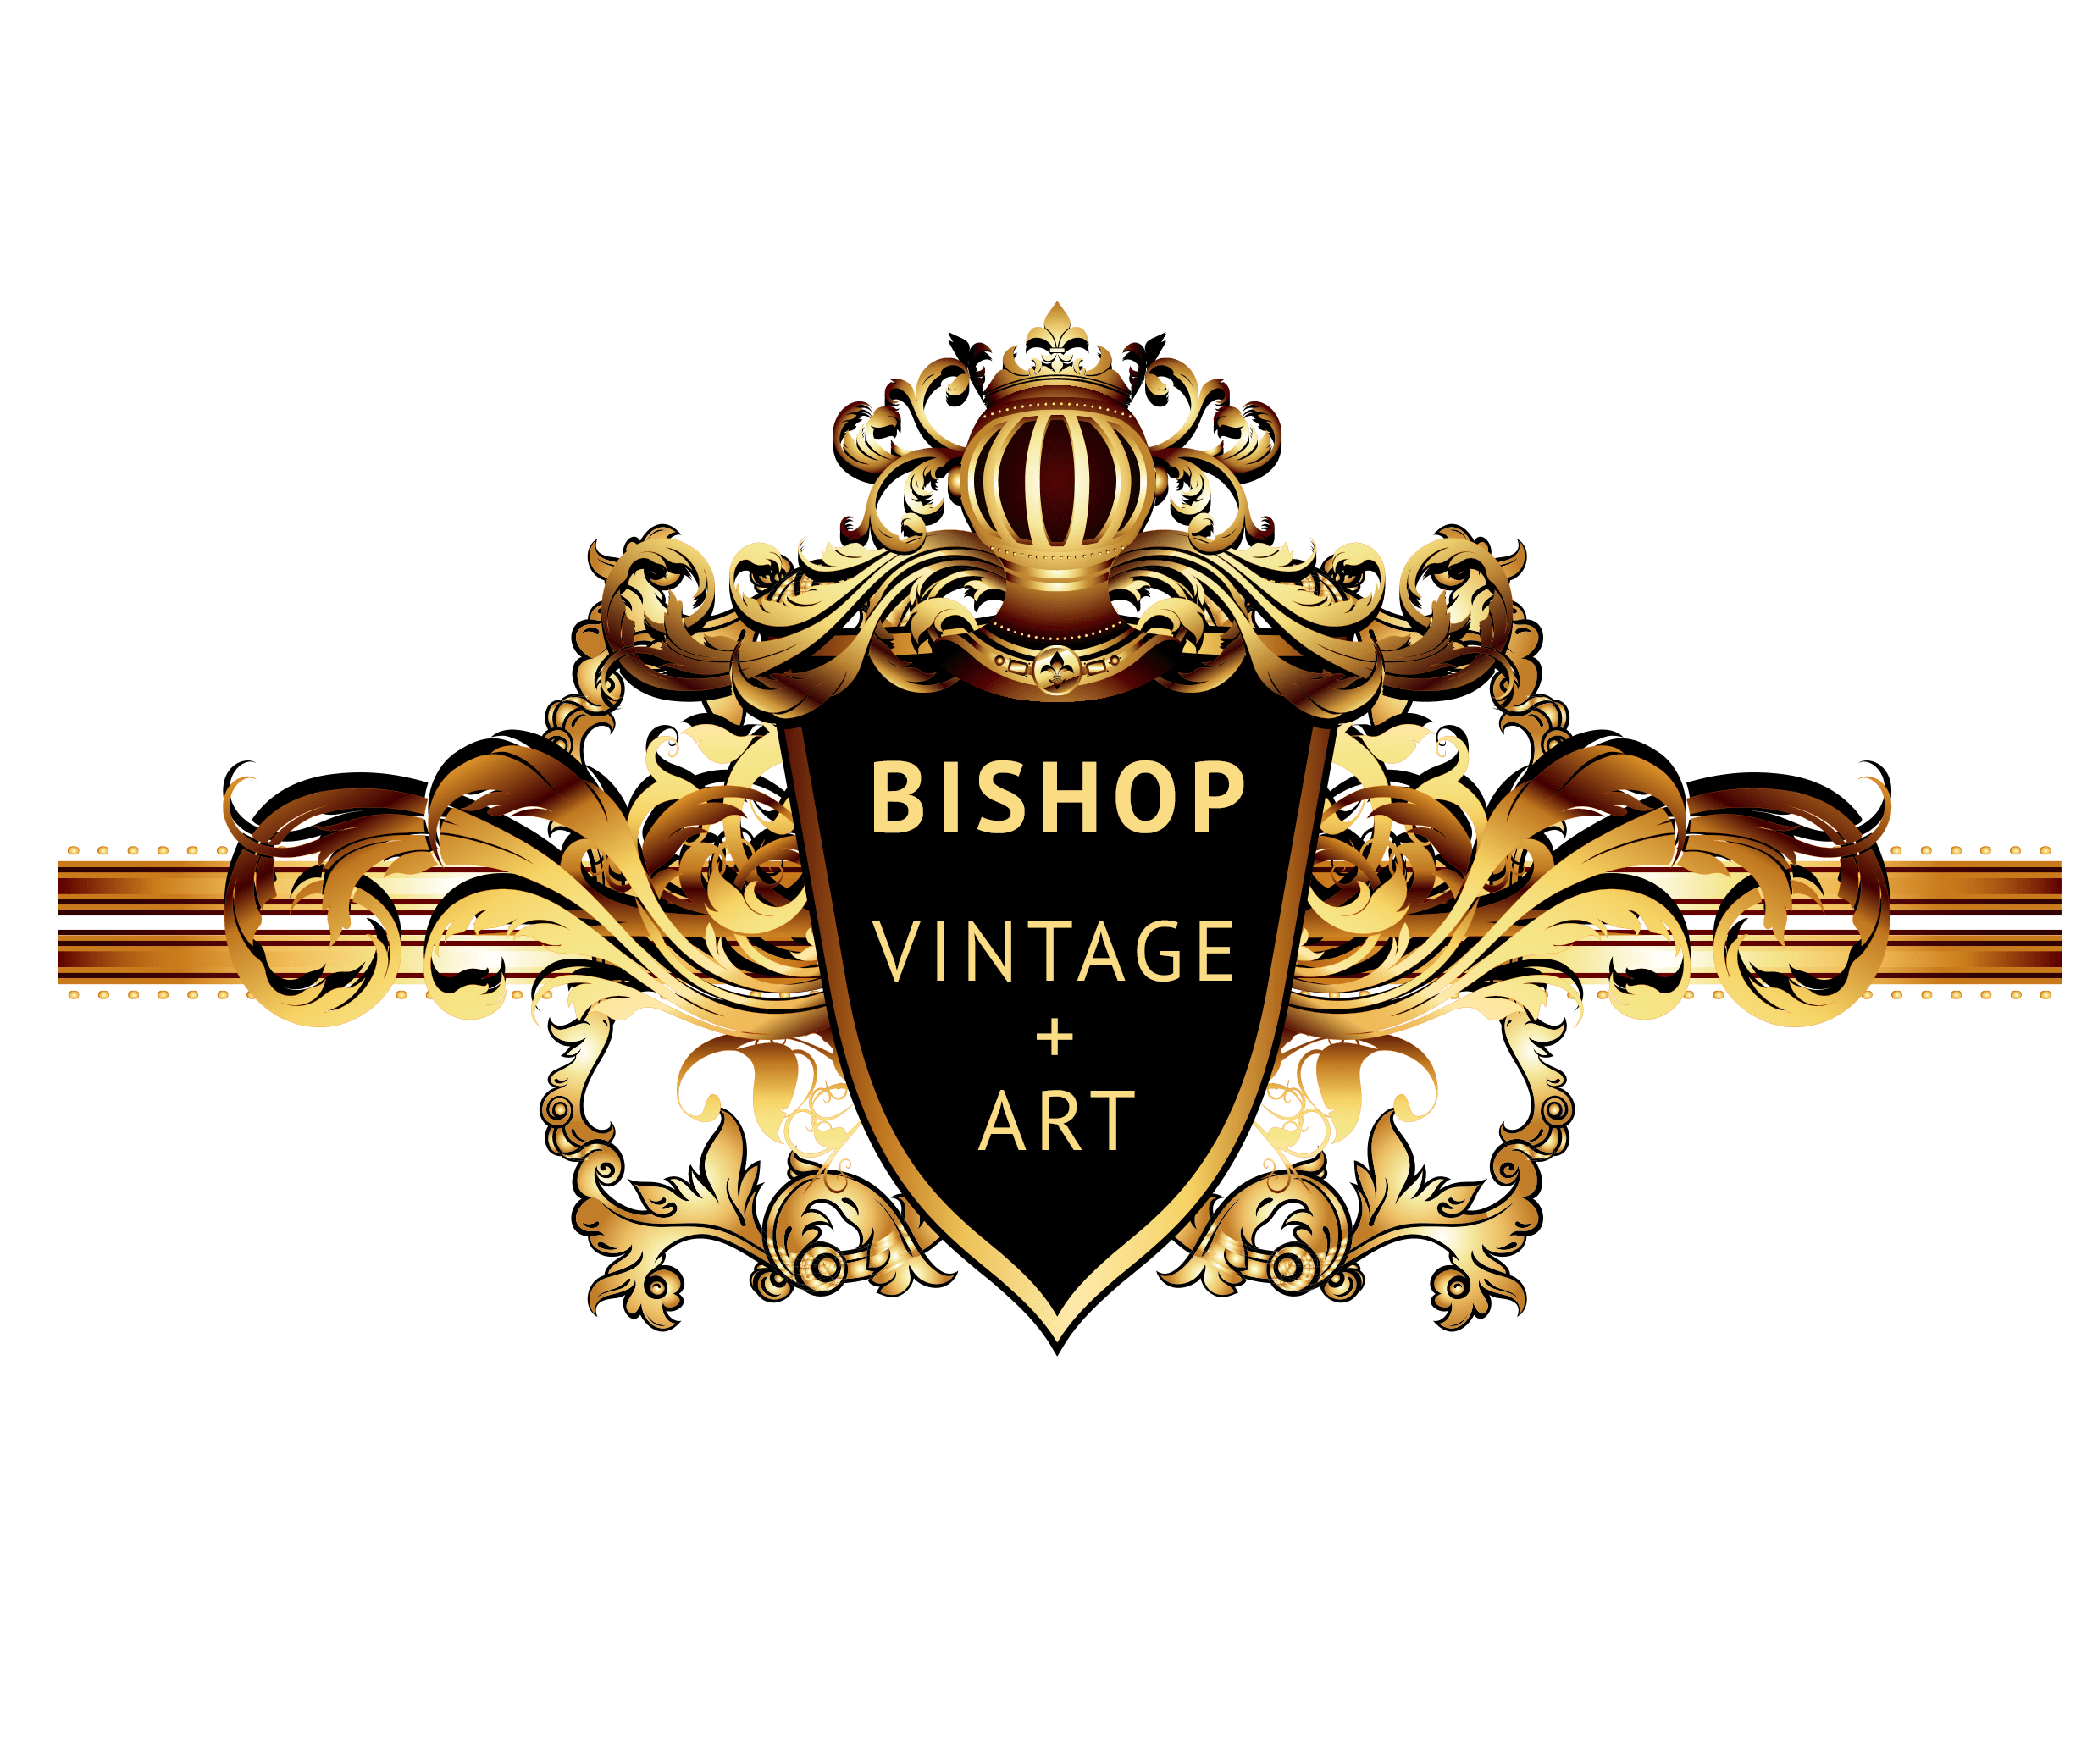 Logo_Bi-Shop+text - Vintage Onlineshop